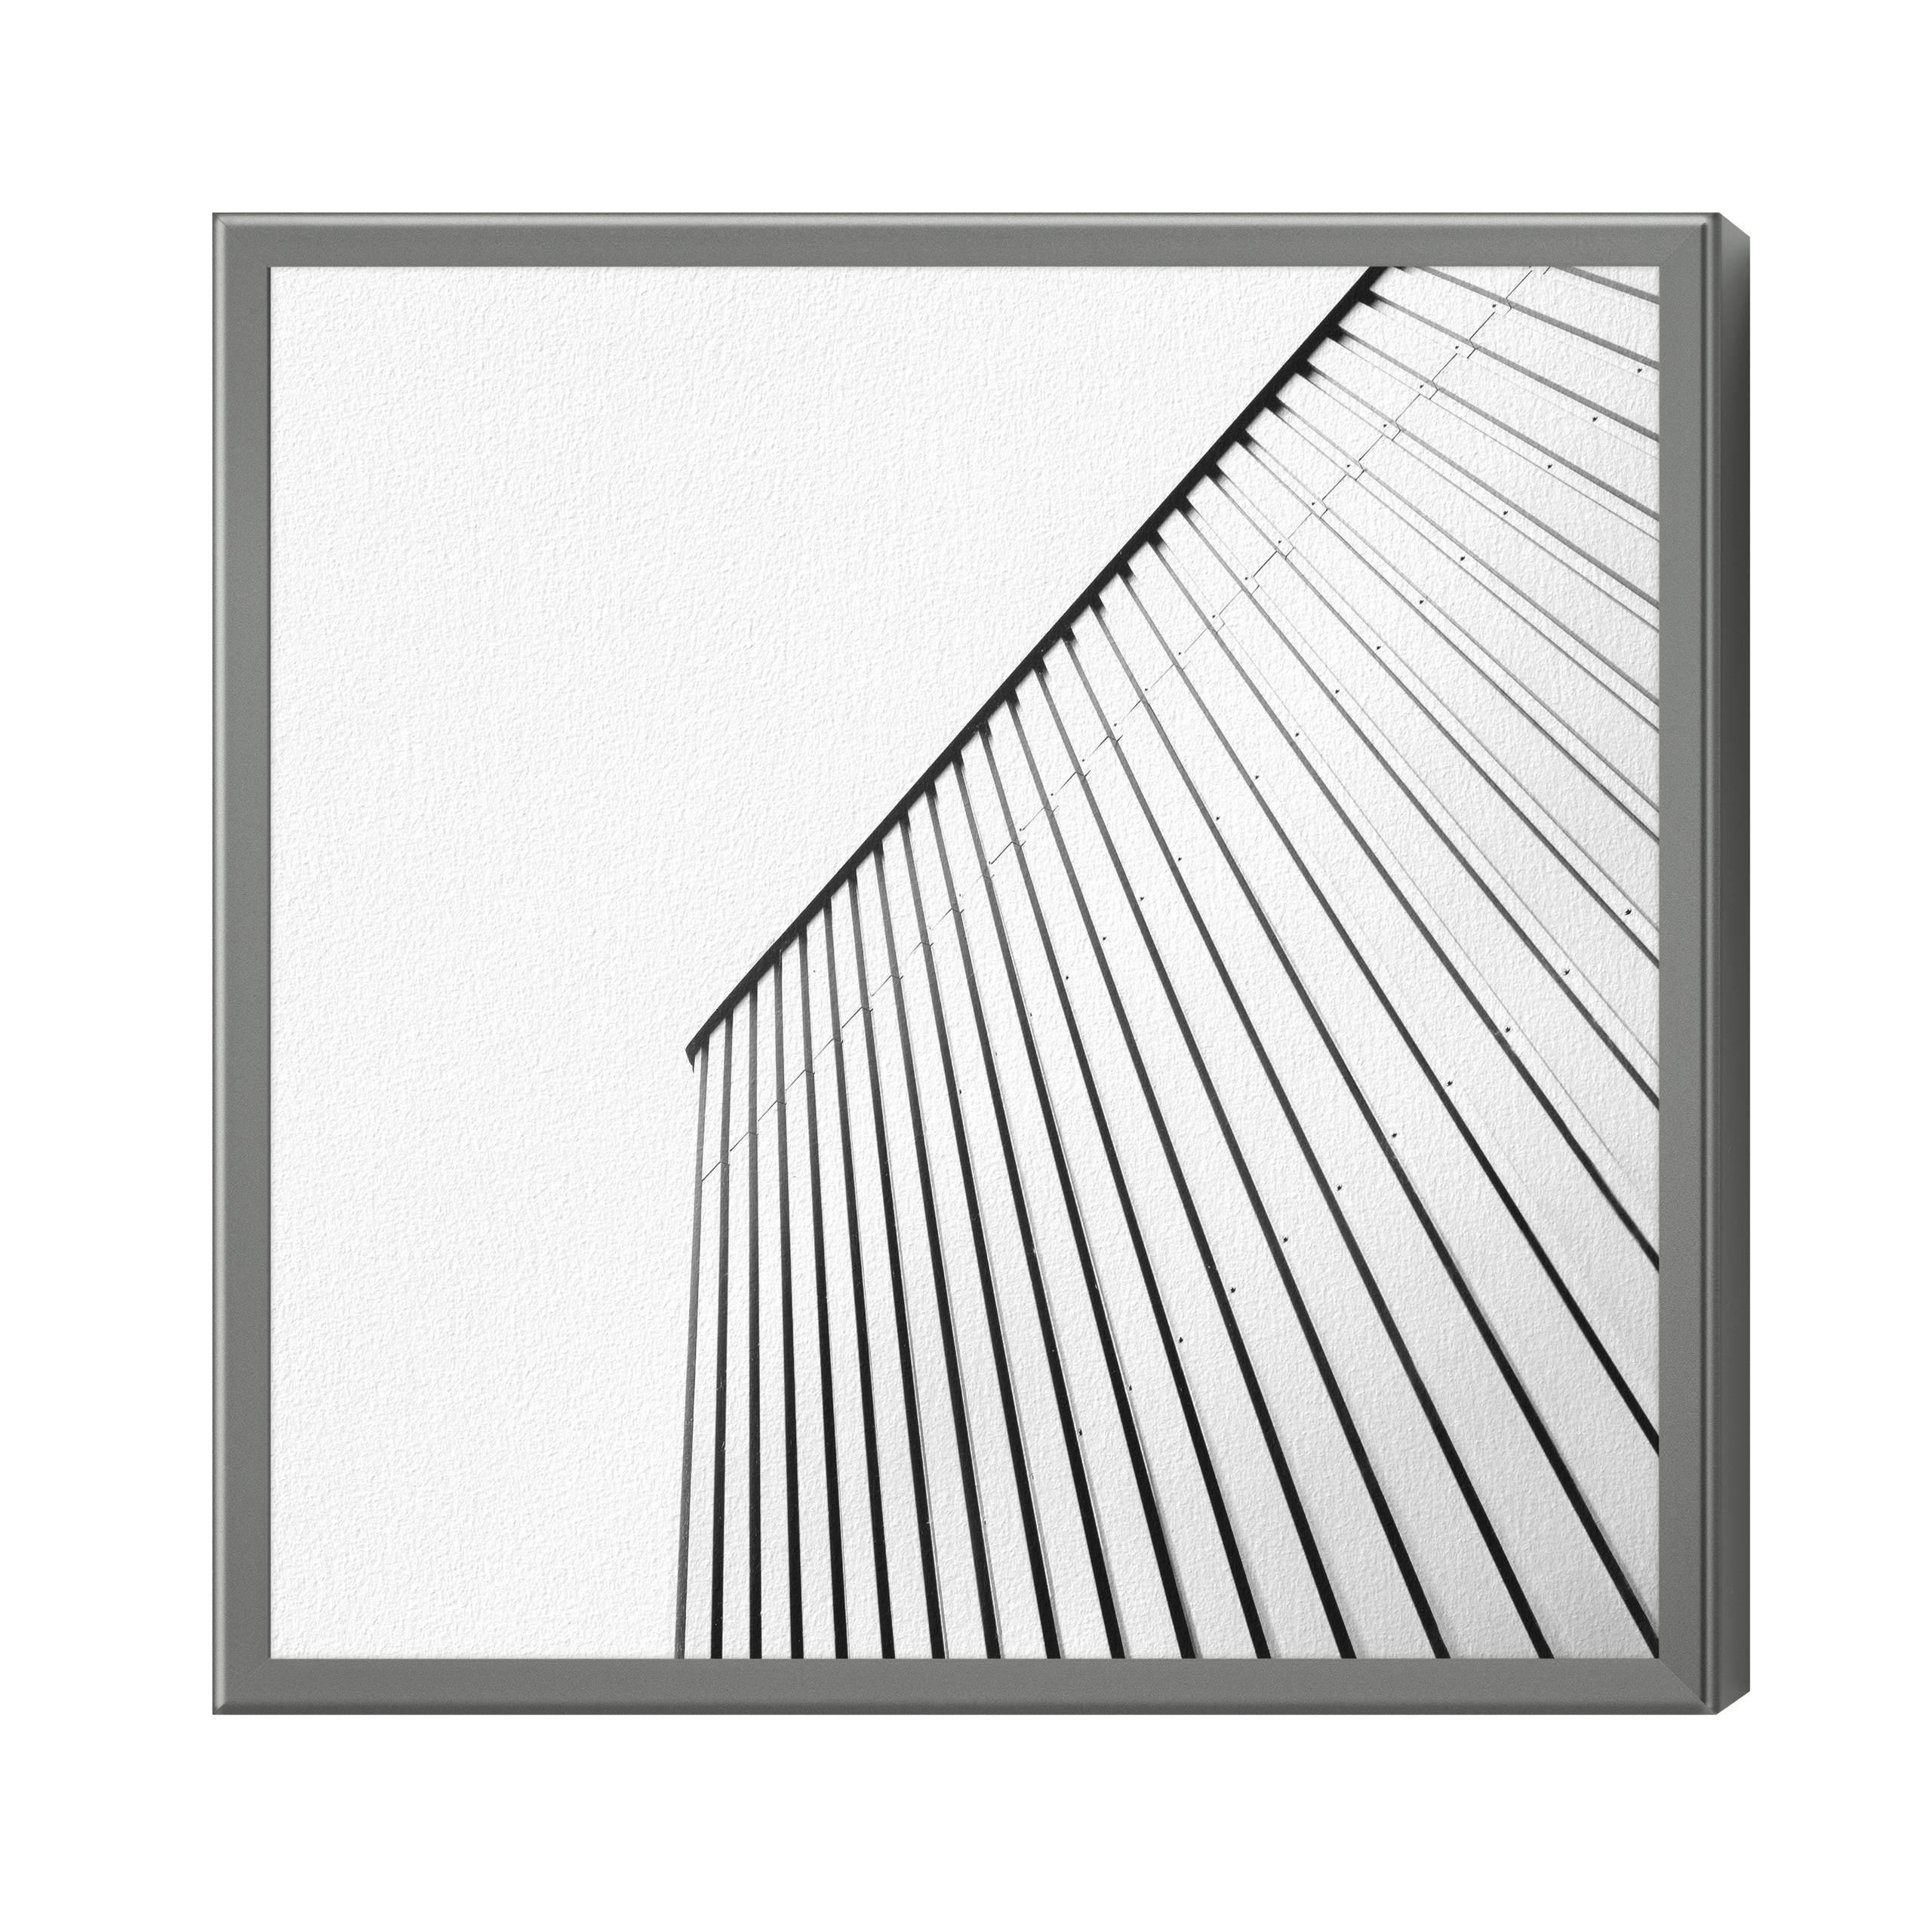 Display-Magnetrahmen günstig online bestellen | HALBE